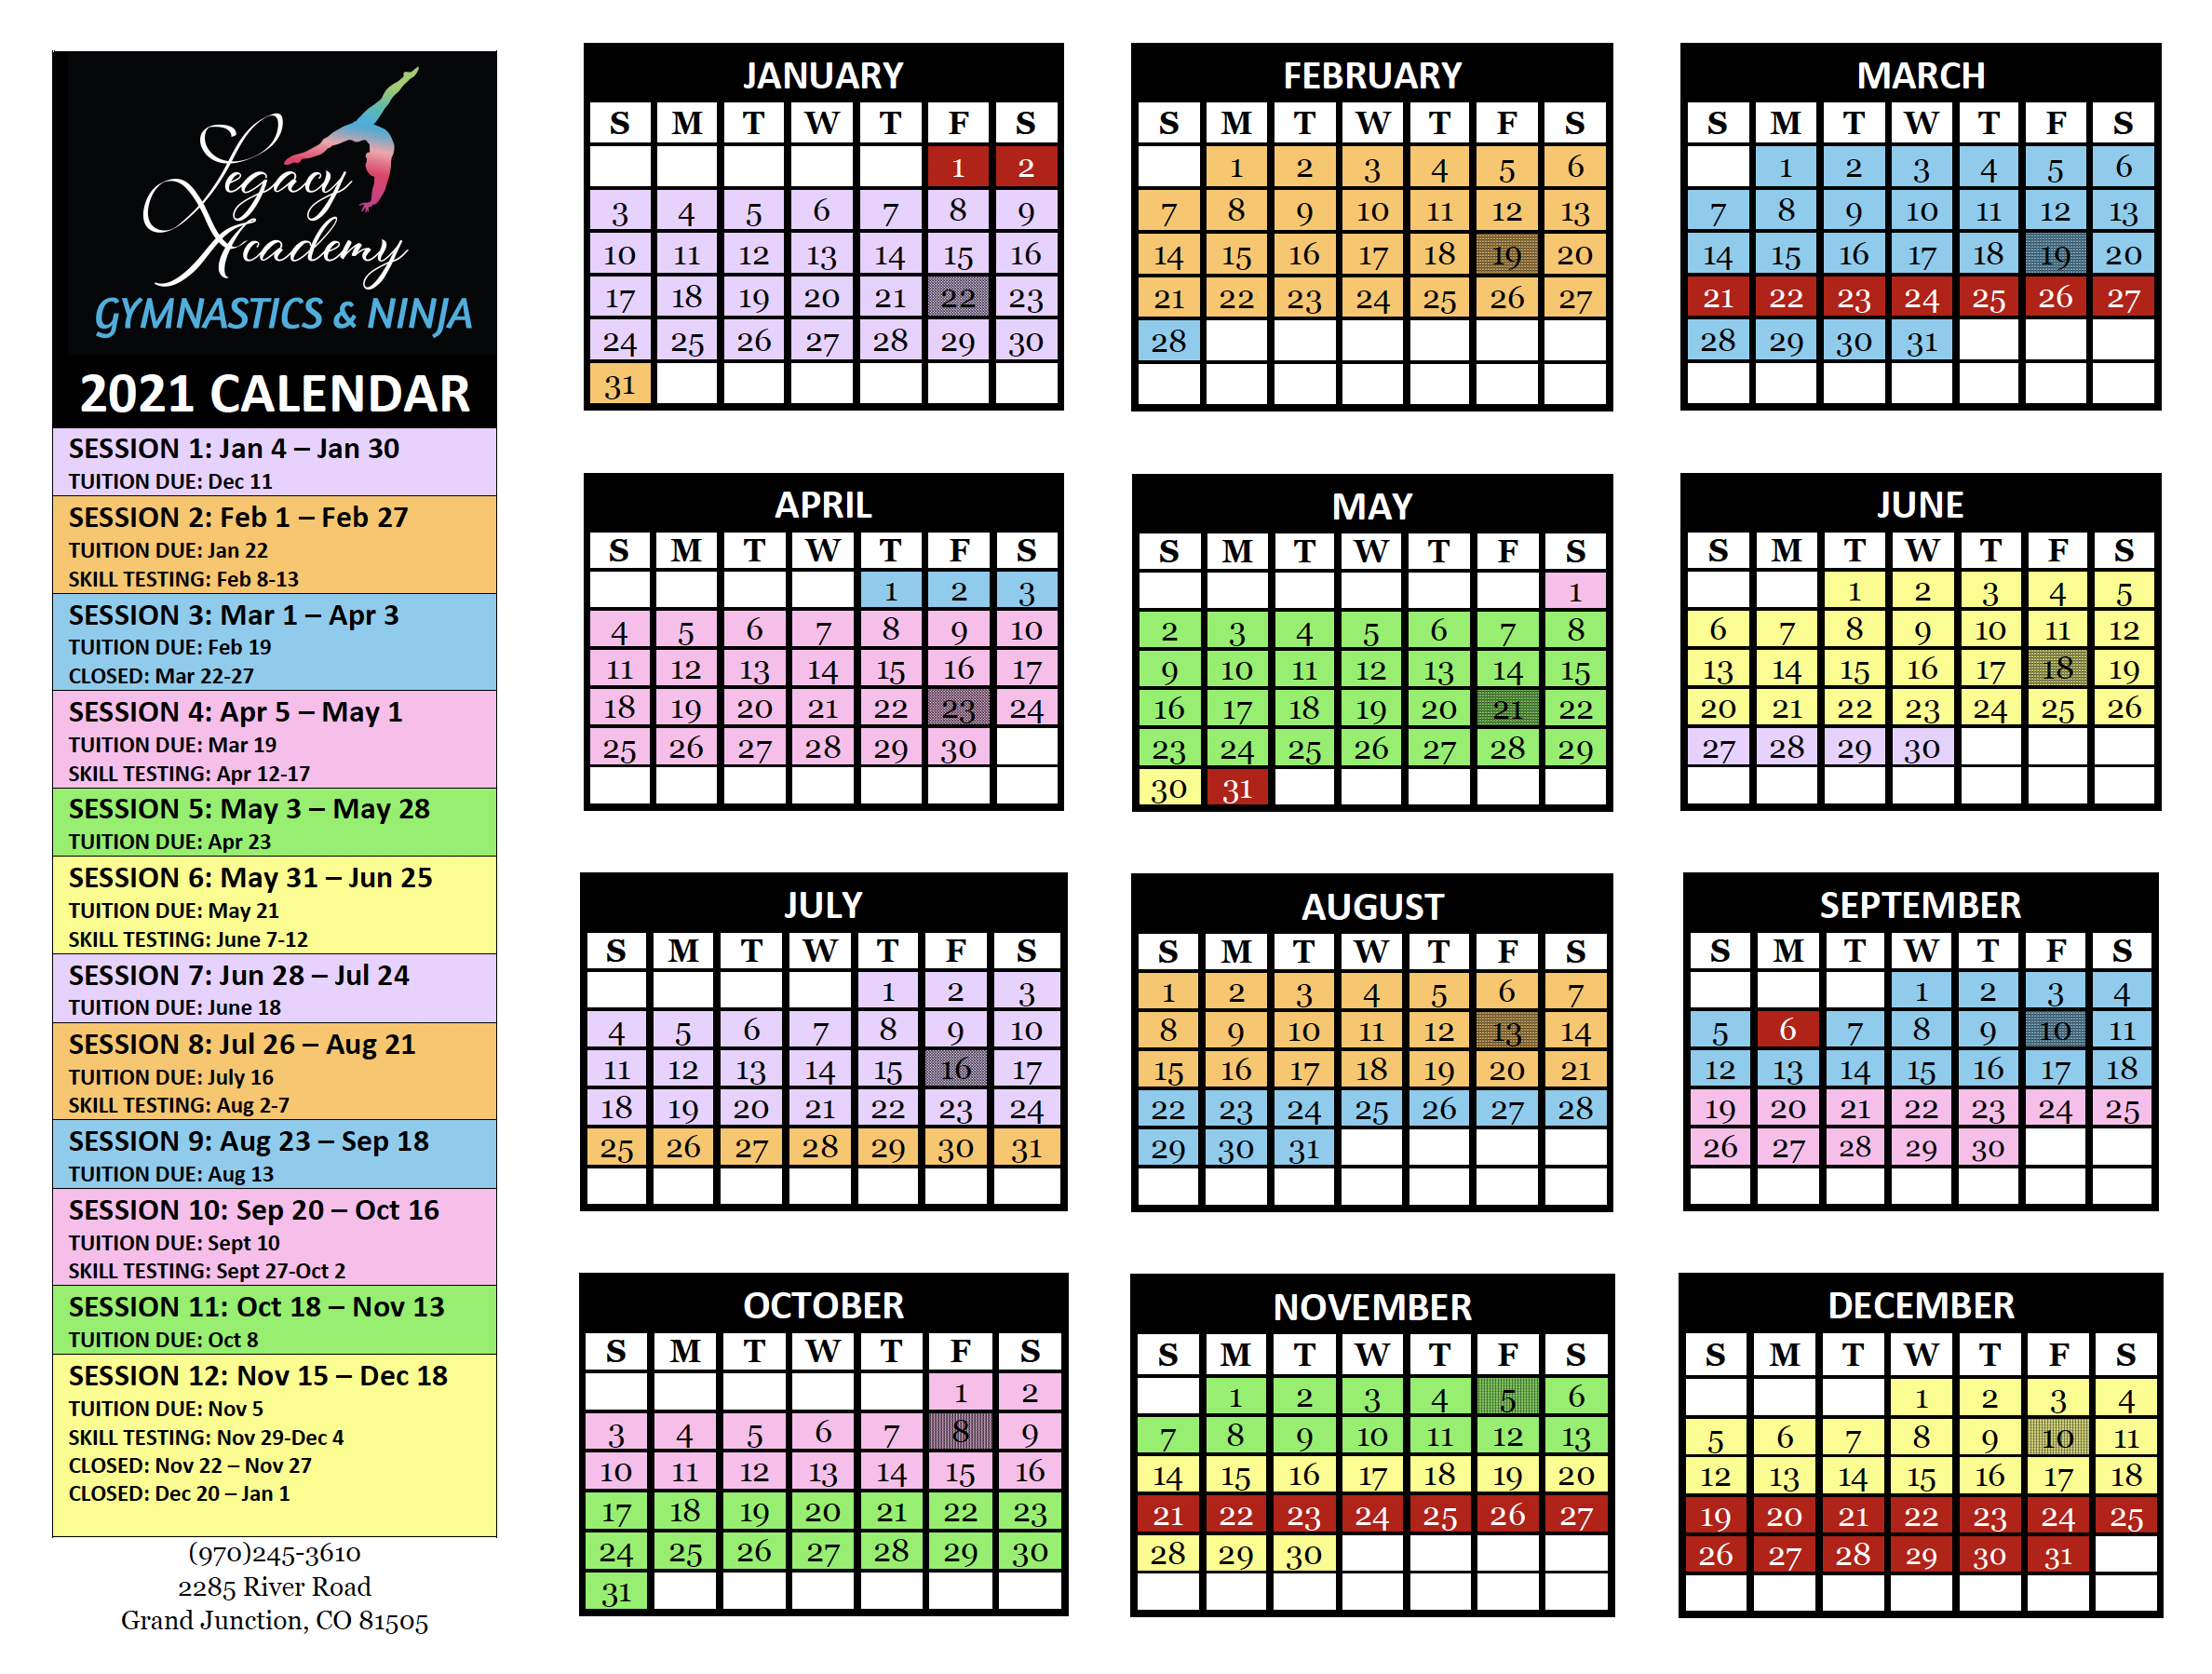 2021 Legacy Gymnastics Ninja Calendar